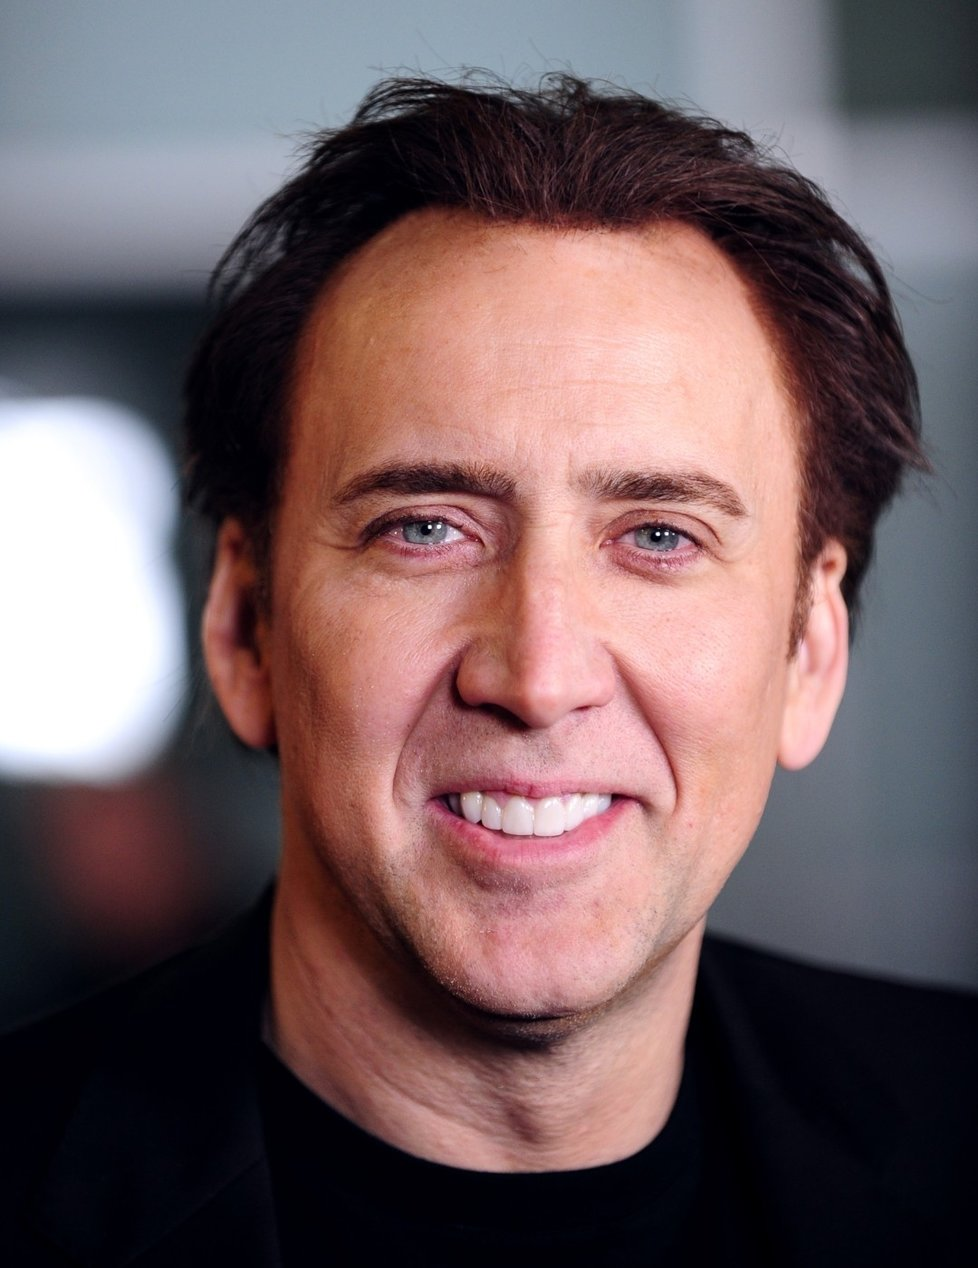 Nicolase Cage